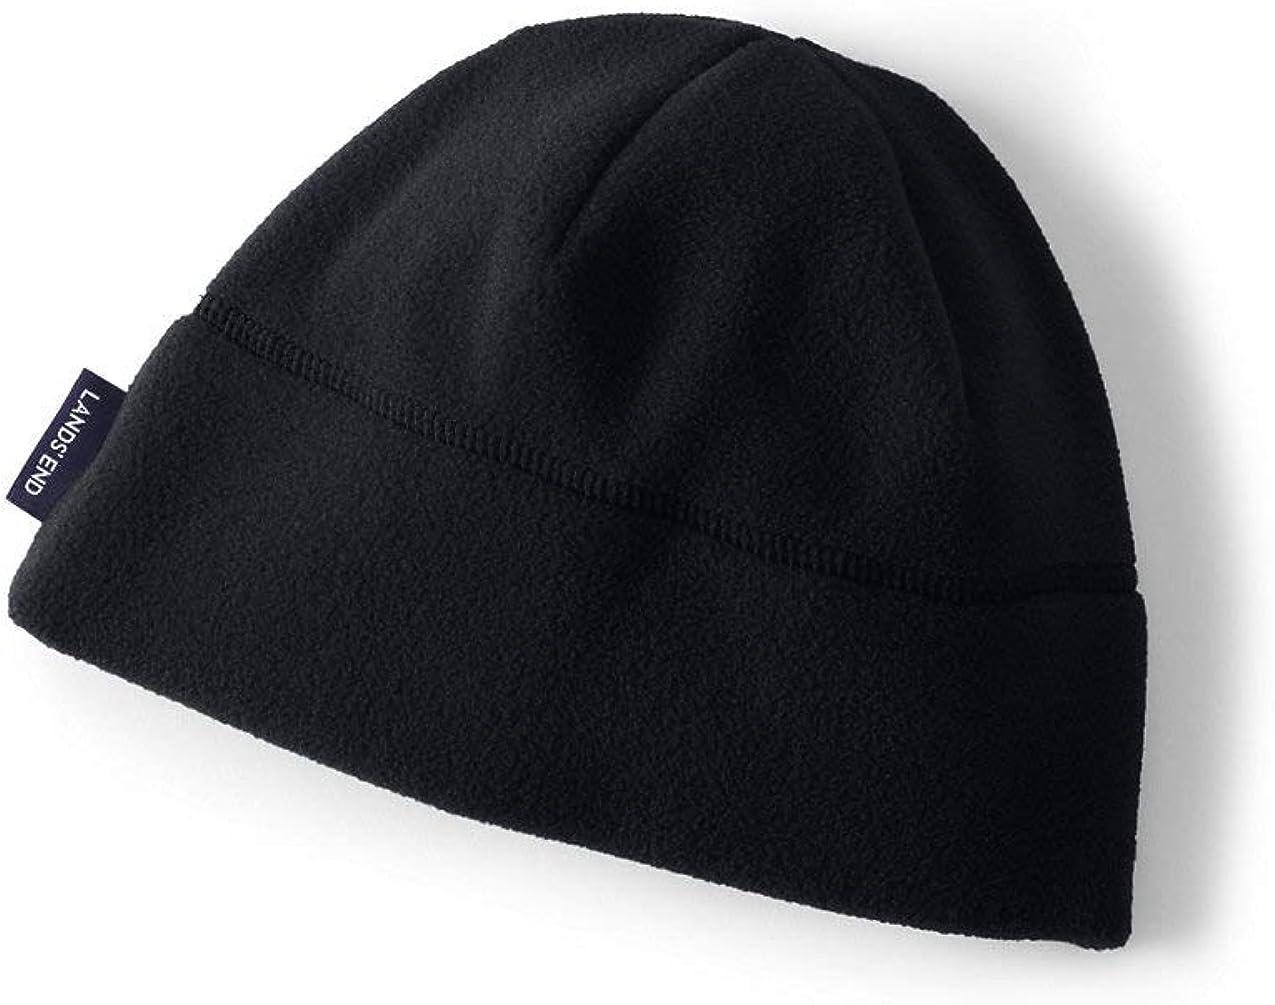 Lands' End Kids Fleece Hat